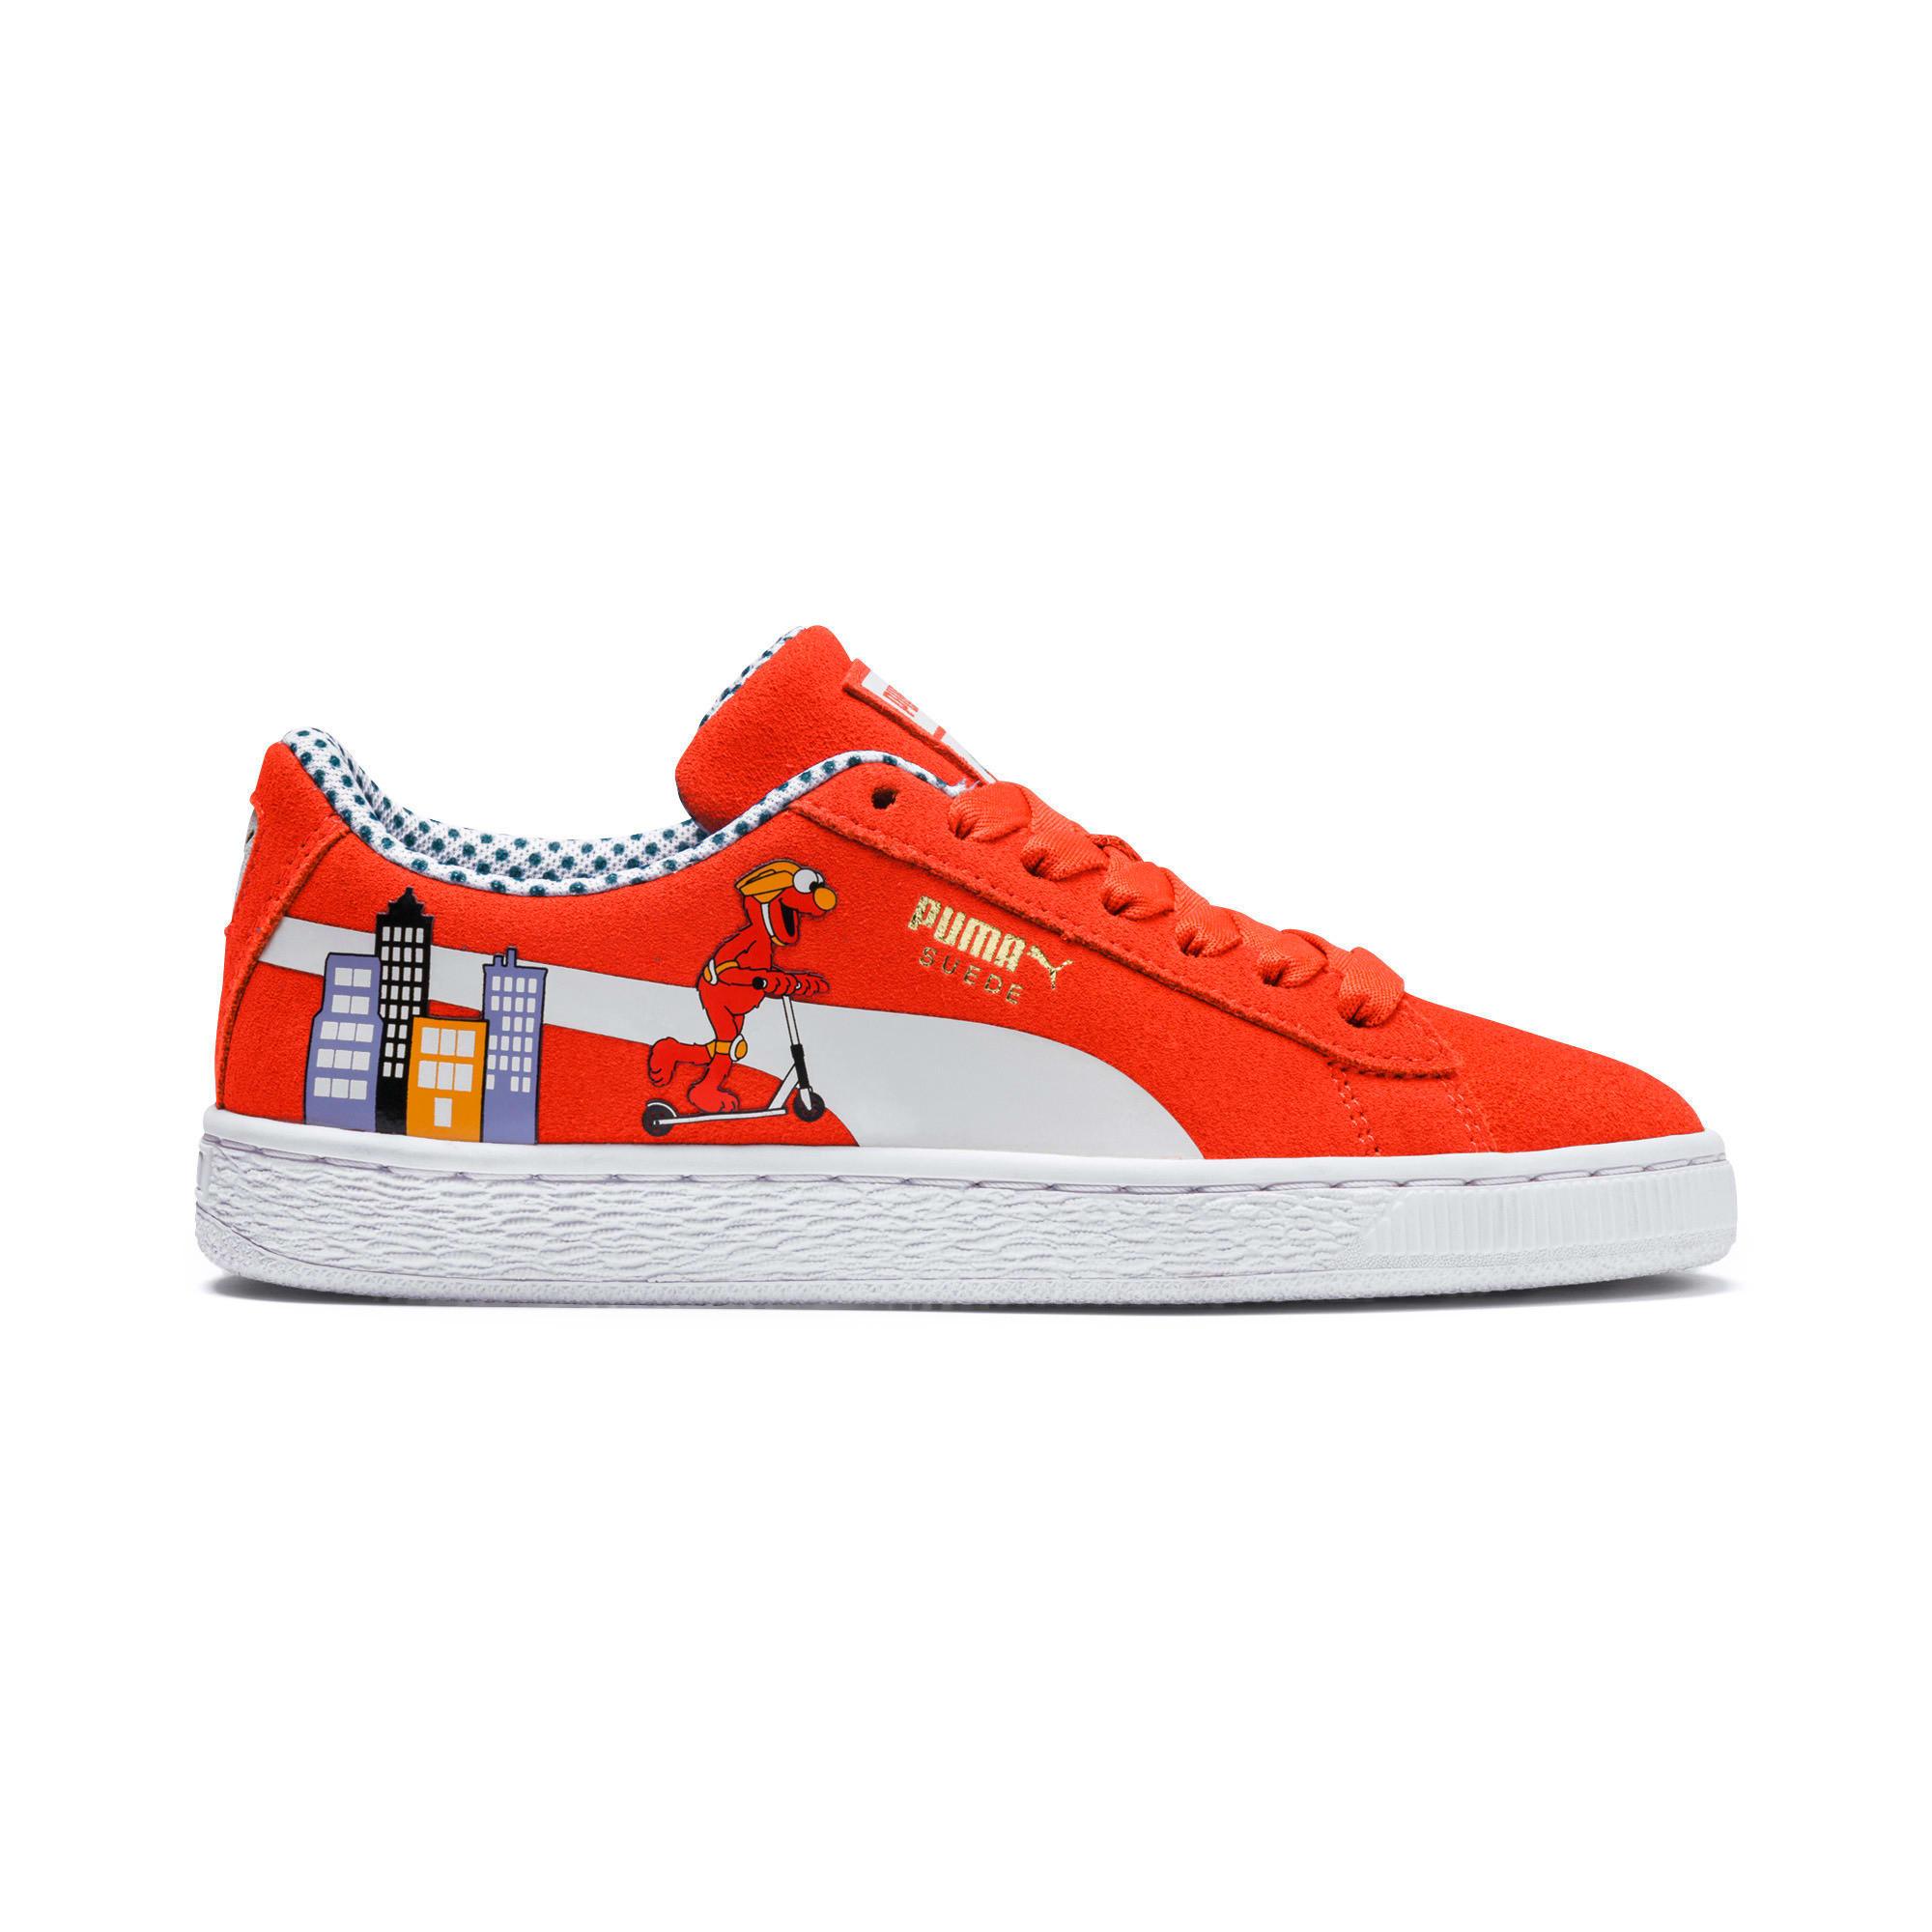 Thumbnail 7 of Sesame Street 50 Suede Little Kids' Shoes, Cherry Tomato-Puma White, medium